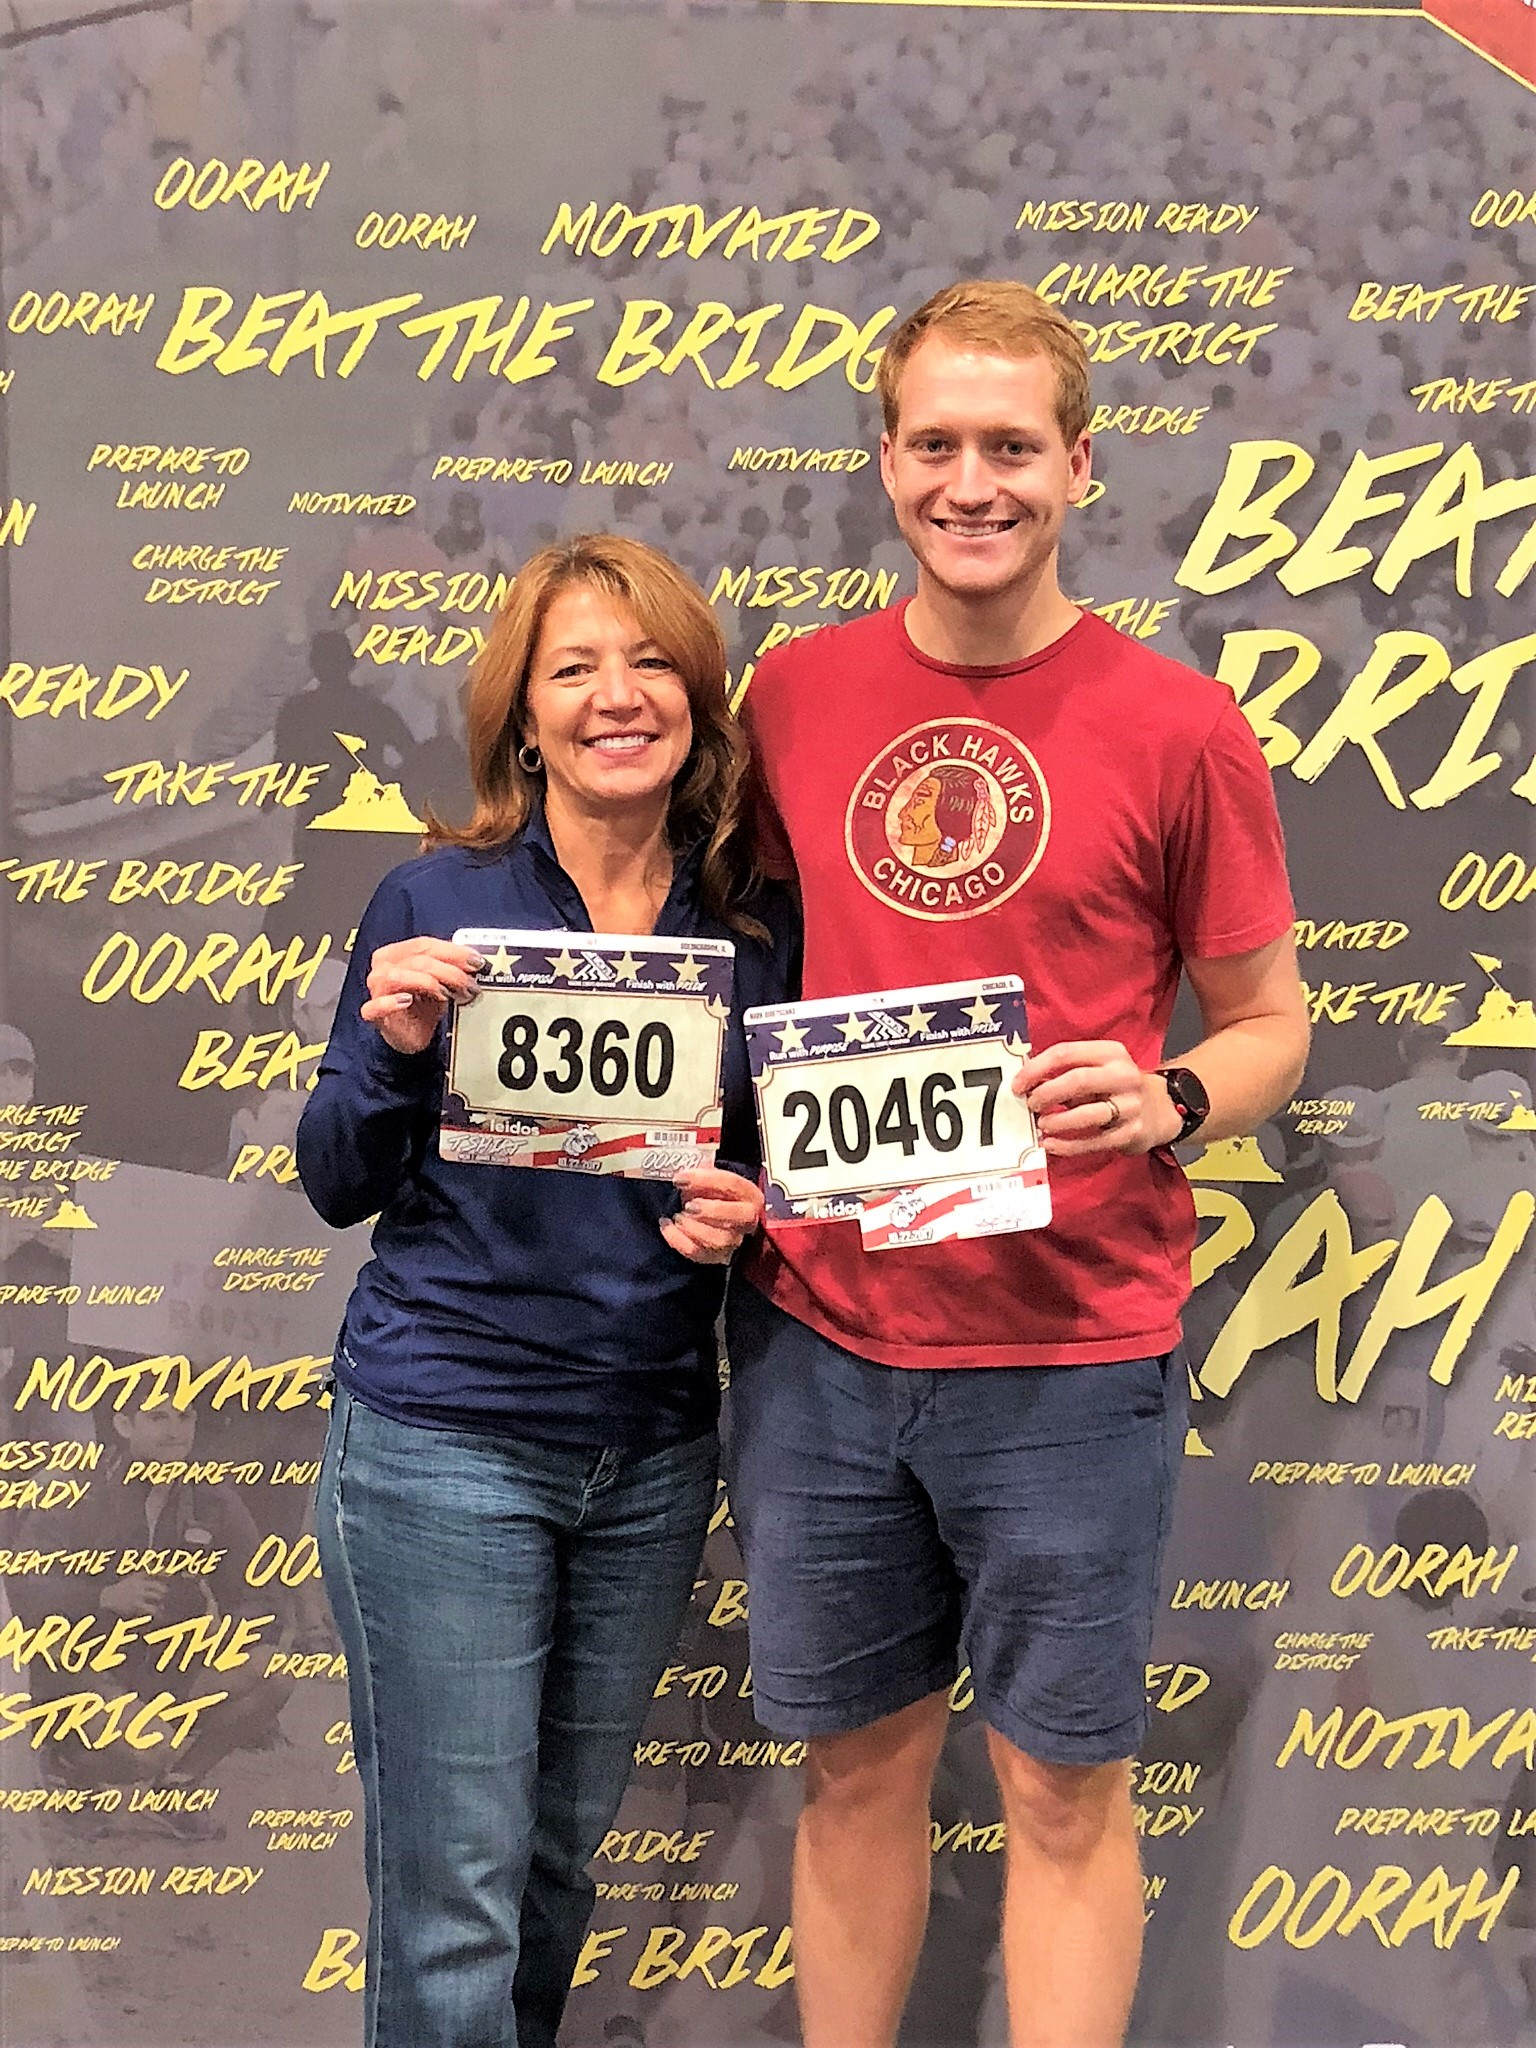 Race recap 2017 marine corps marathon the accidental for Marine corps marathon shirt 2017